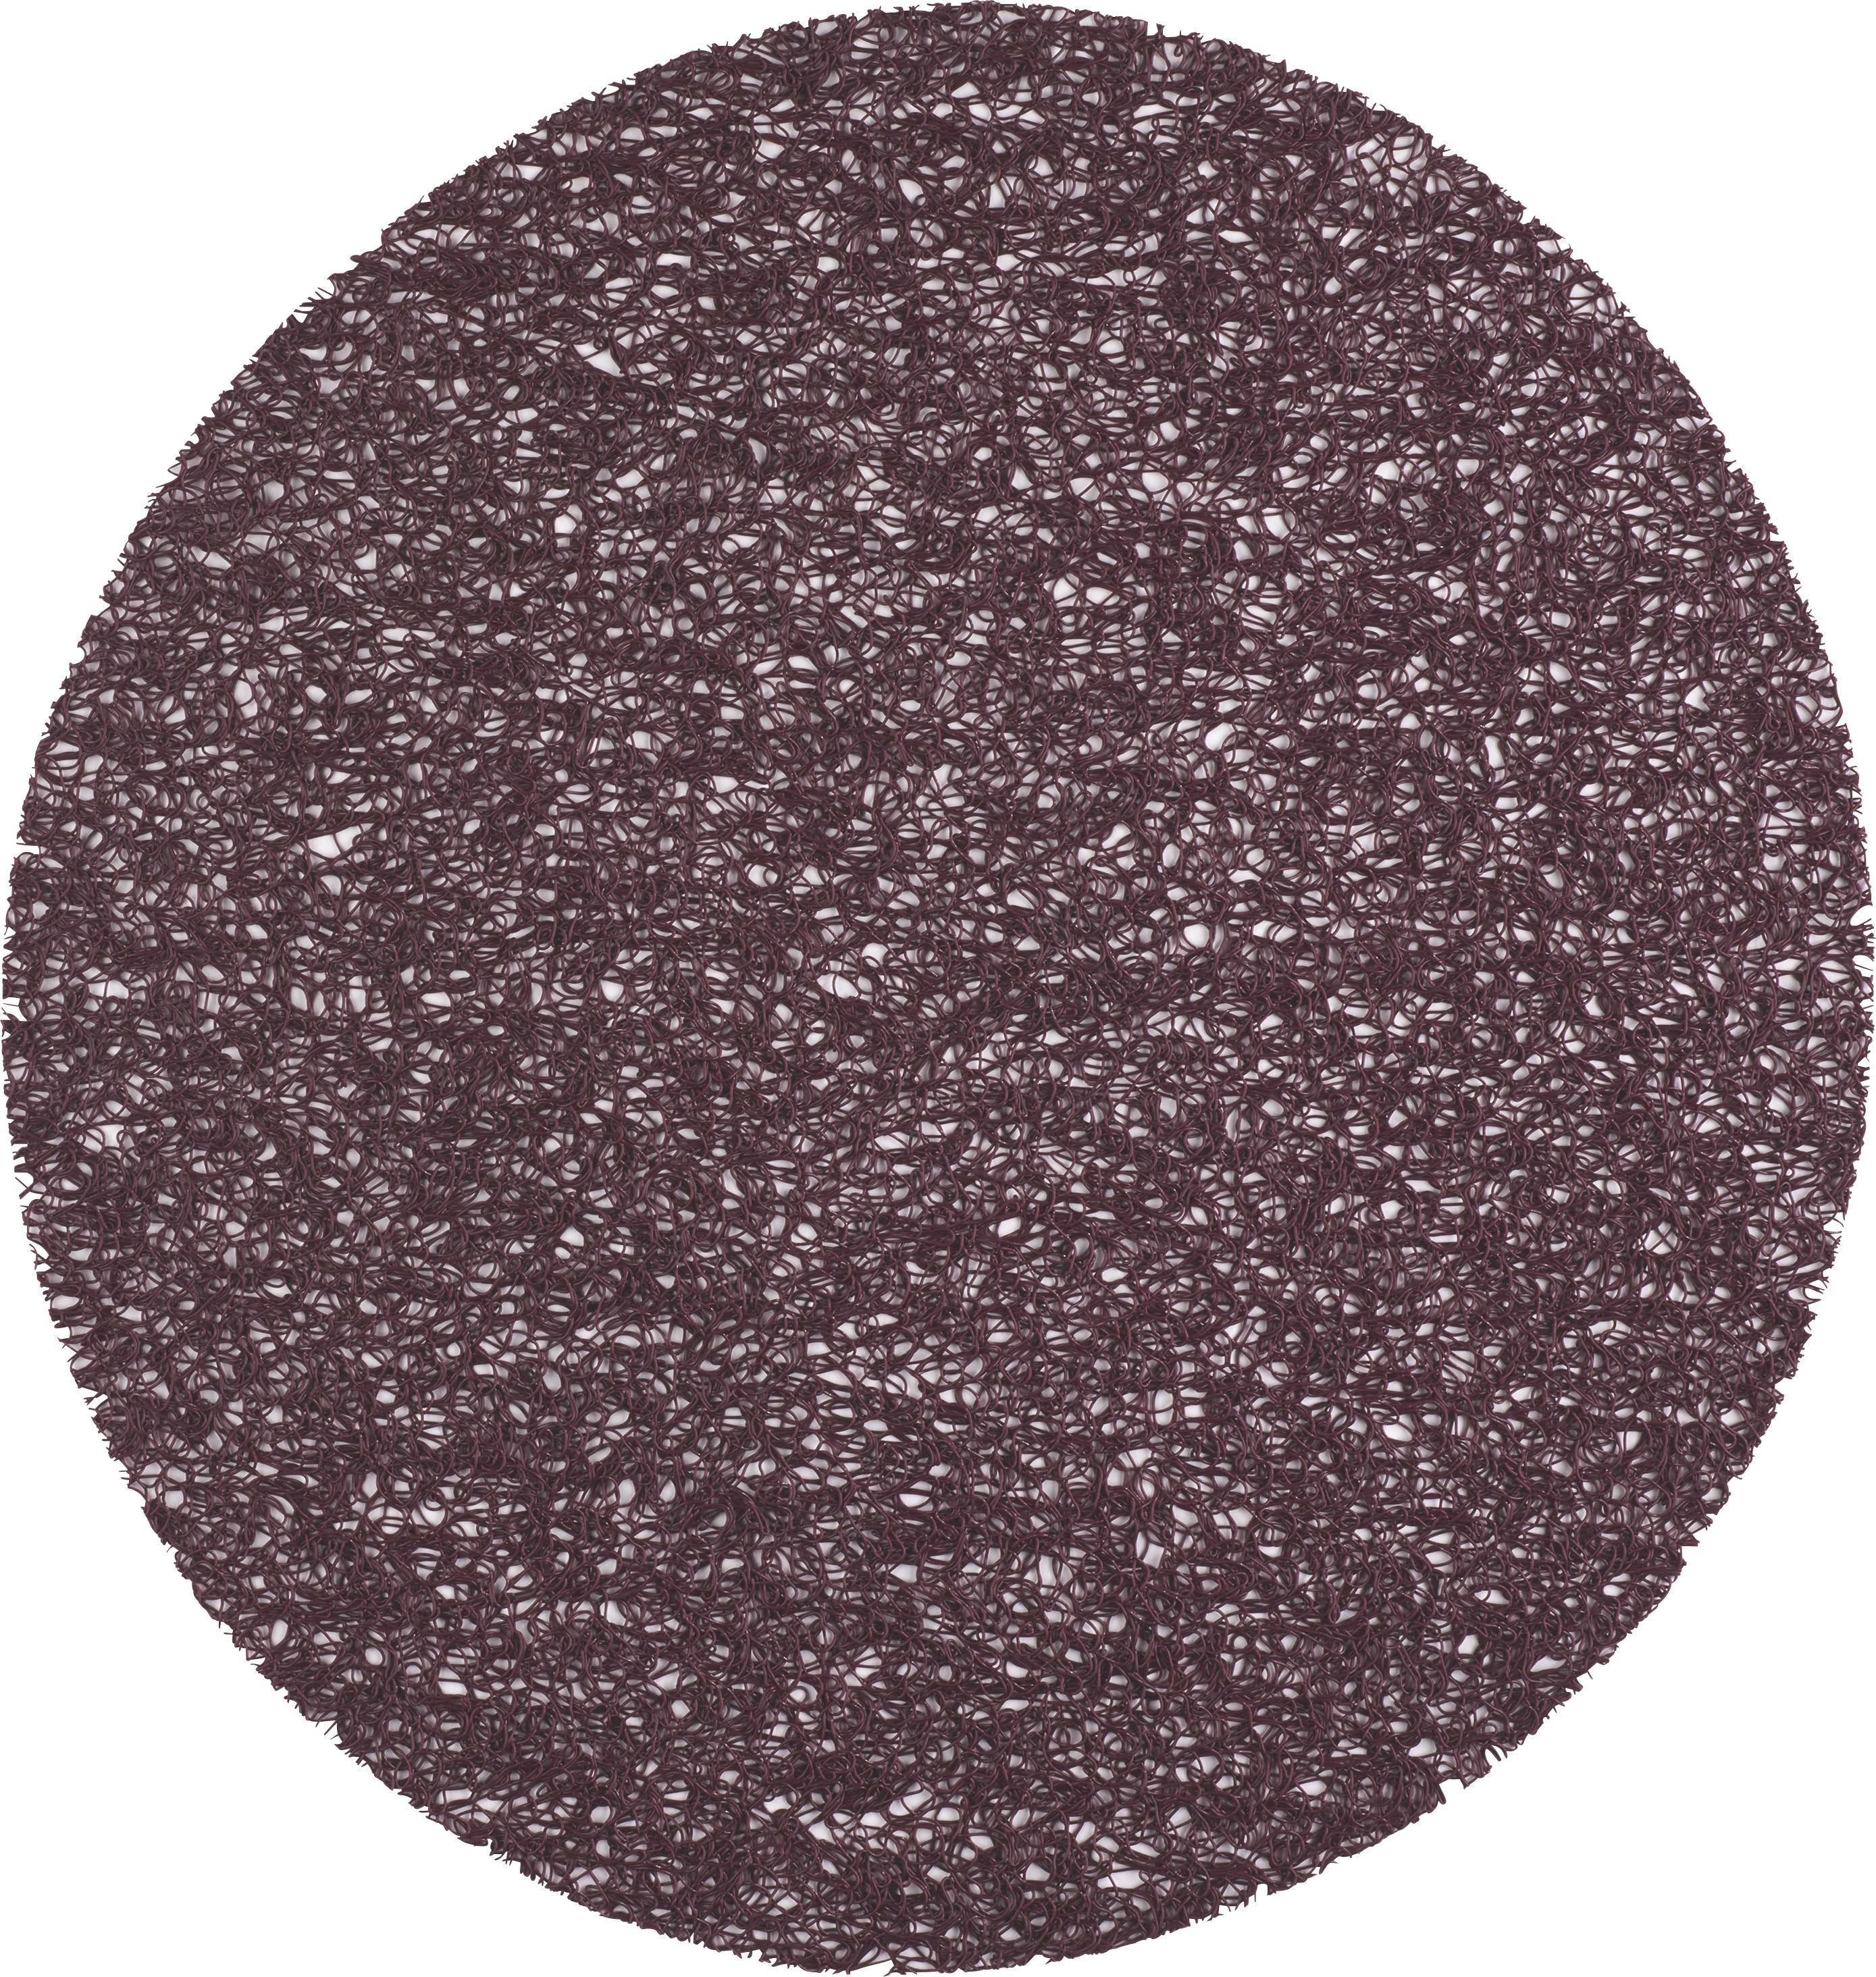 Tischset Win in verschiedenen Farben - Blau/Dunkelgrau, MODERN, Kunststoff (38cm)